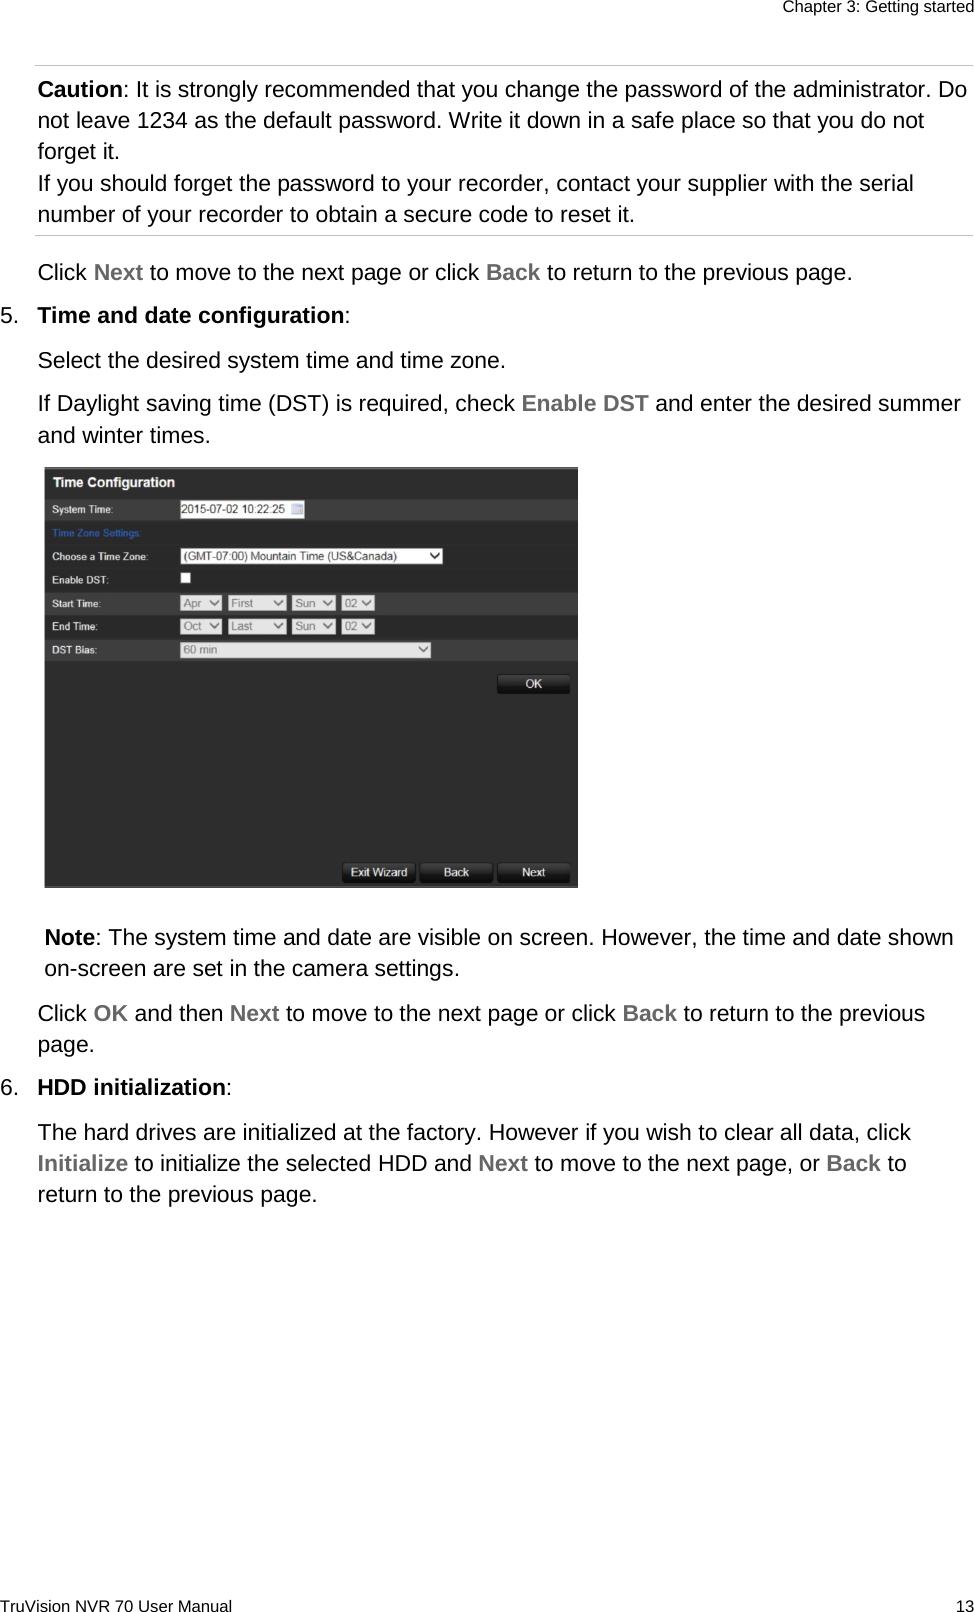 InterLogix 1073062B Truvision Nvr 70 User Manual En